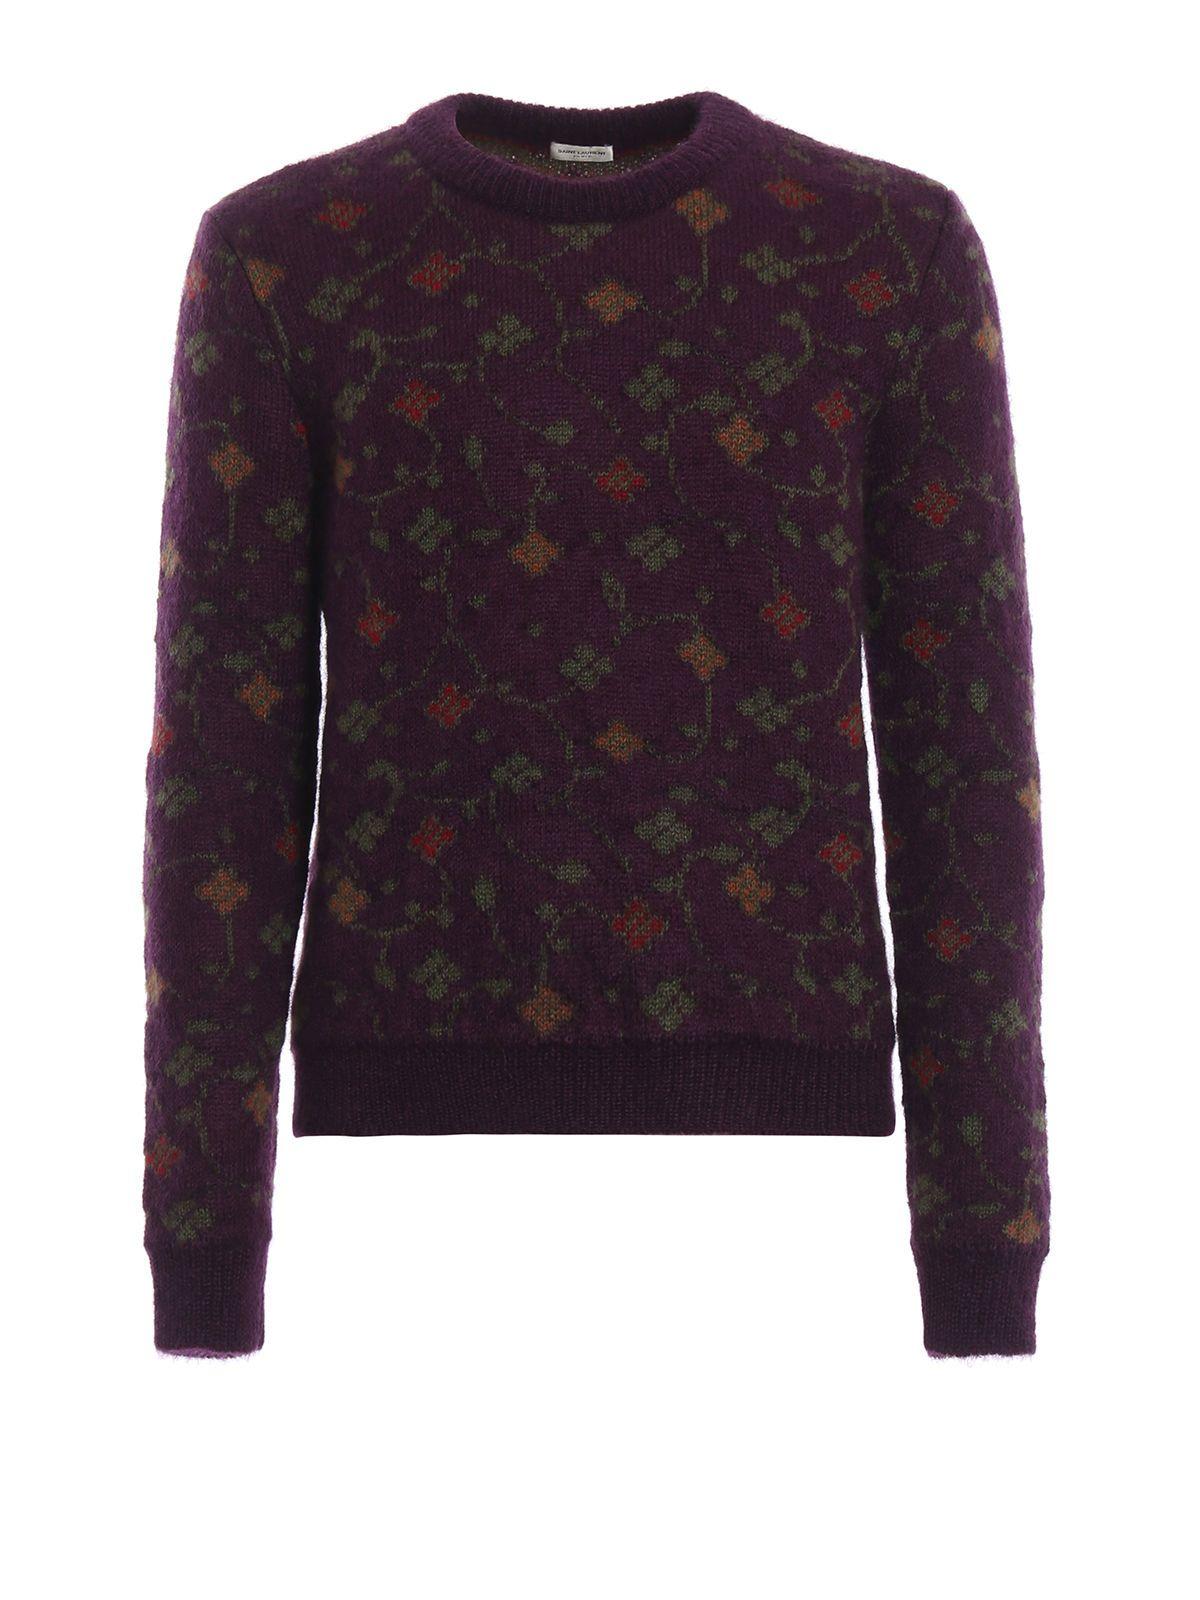 Saint Laurent Floral Intarsia Sweater